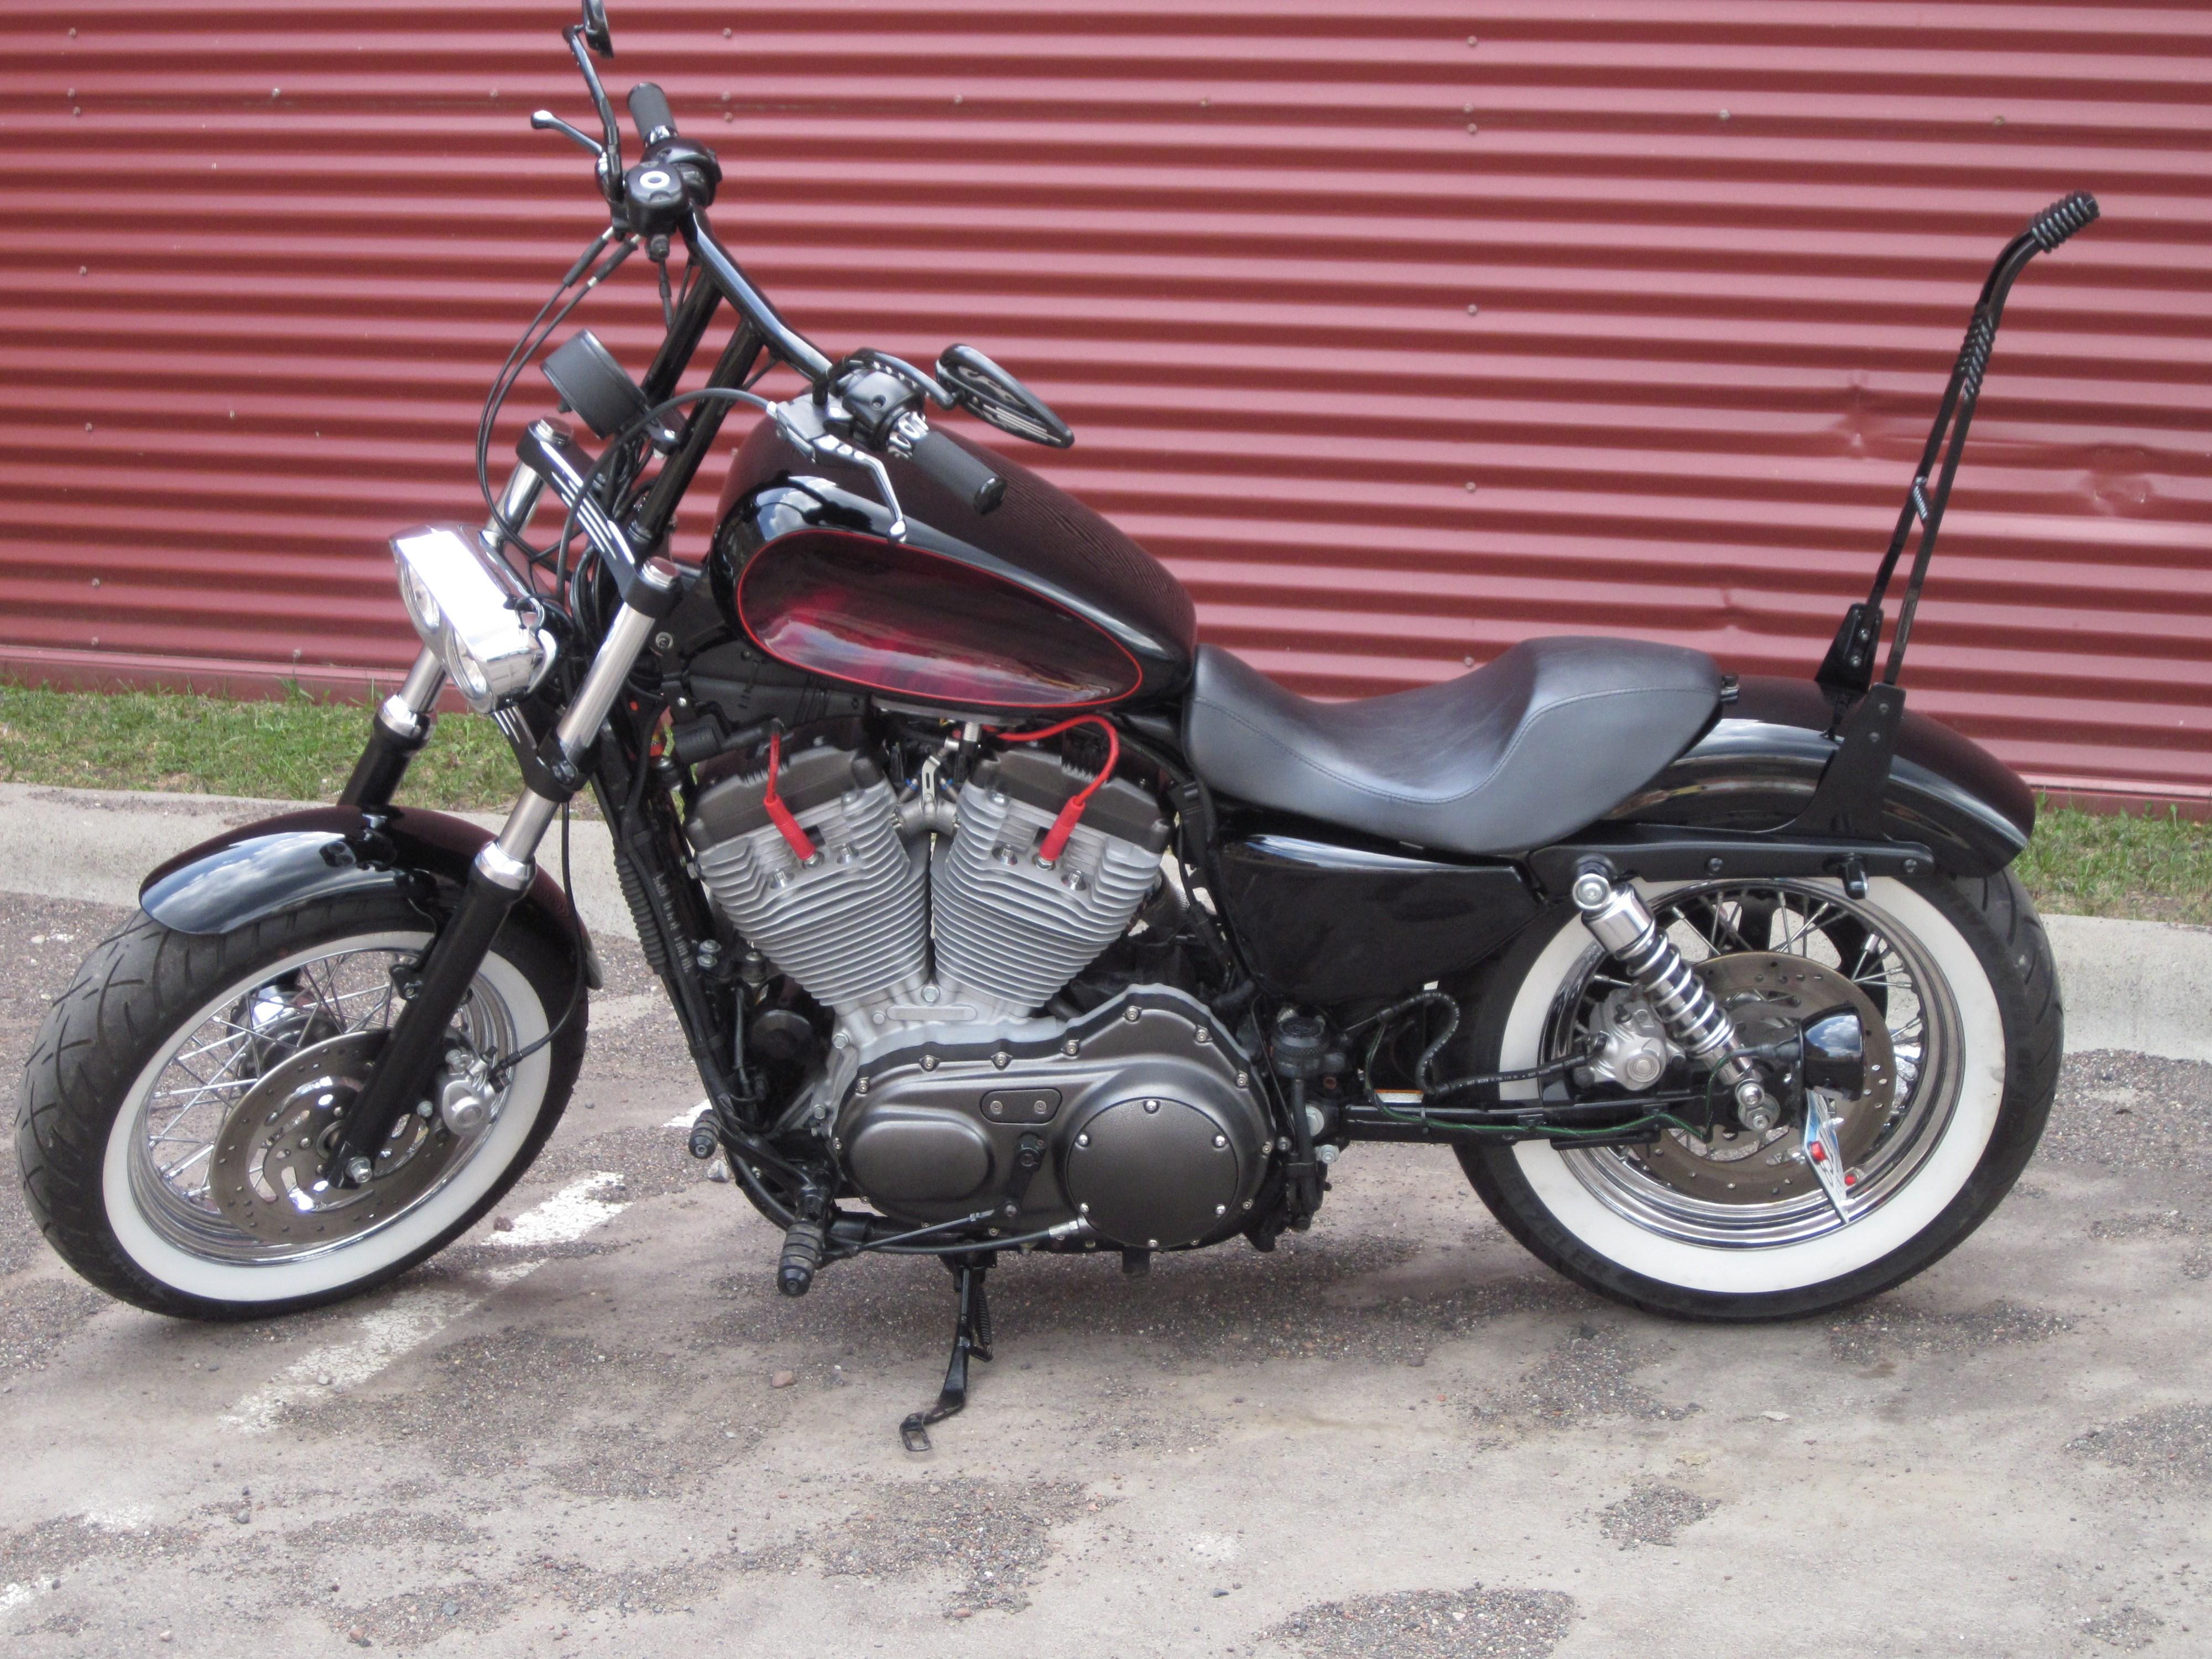 Harley Davidson Dealership Minnesota >> 2007 Harley-Davidson® XL883C Sportster® 883 Custom (Black), Duluth, Minnesota (740615)   CycleCrunch